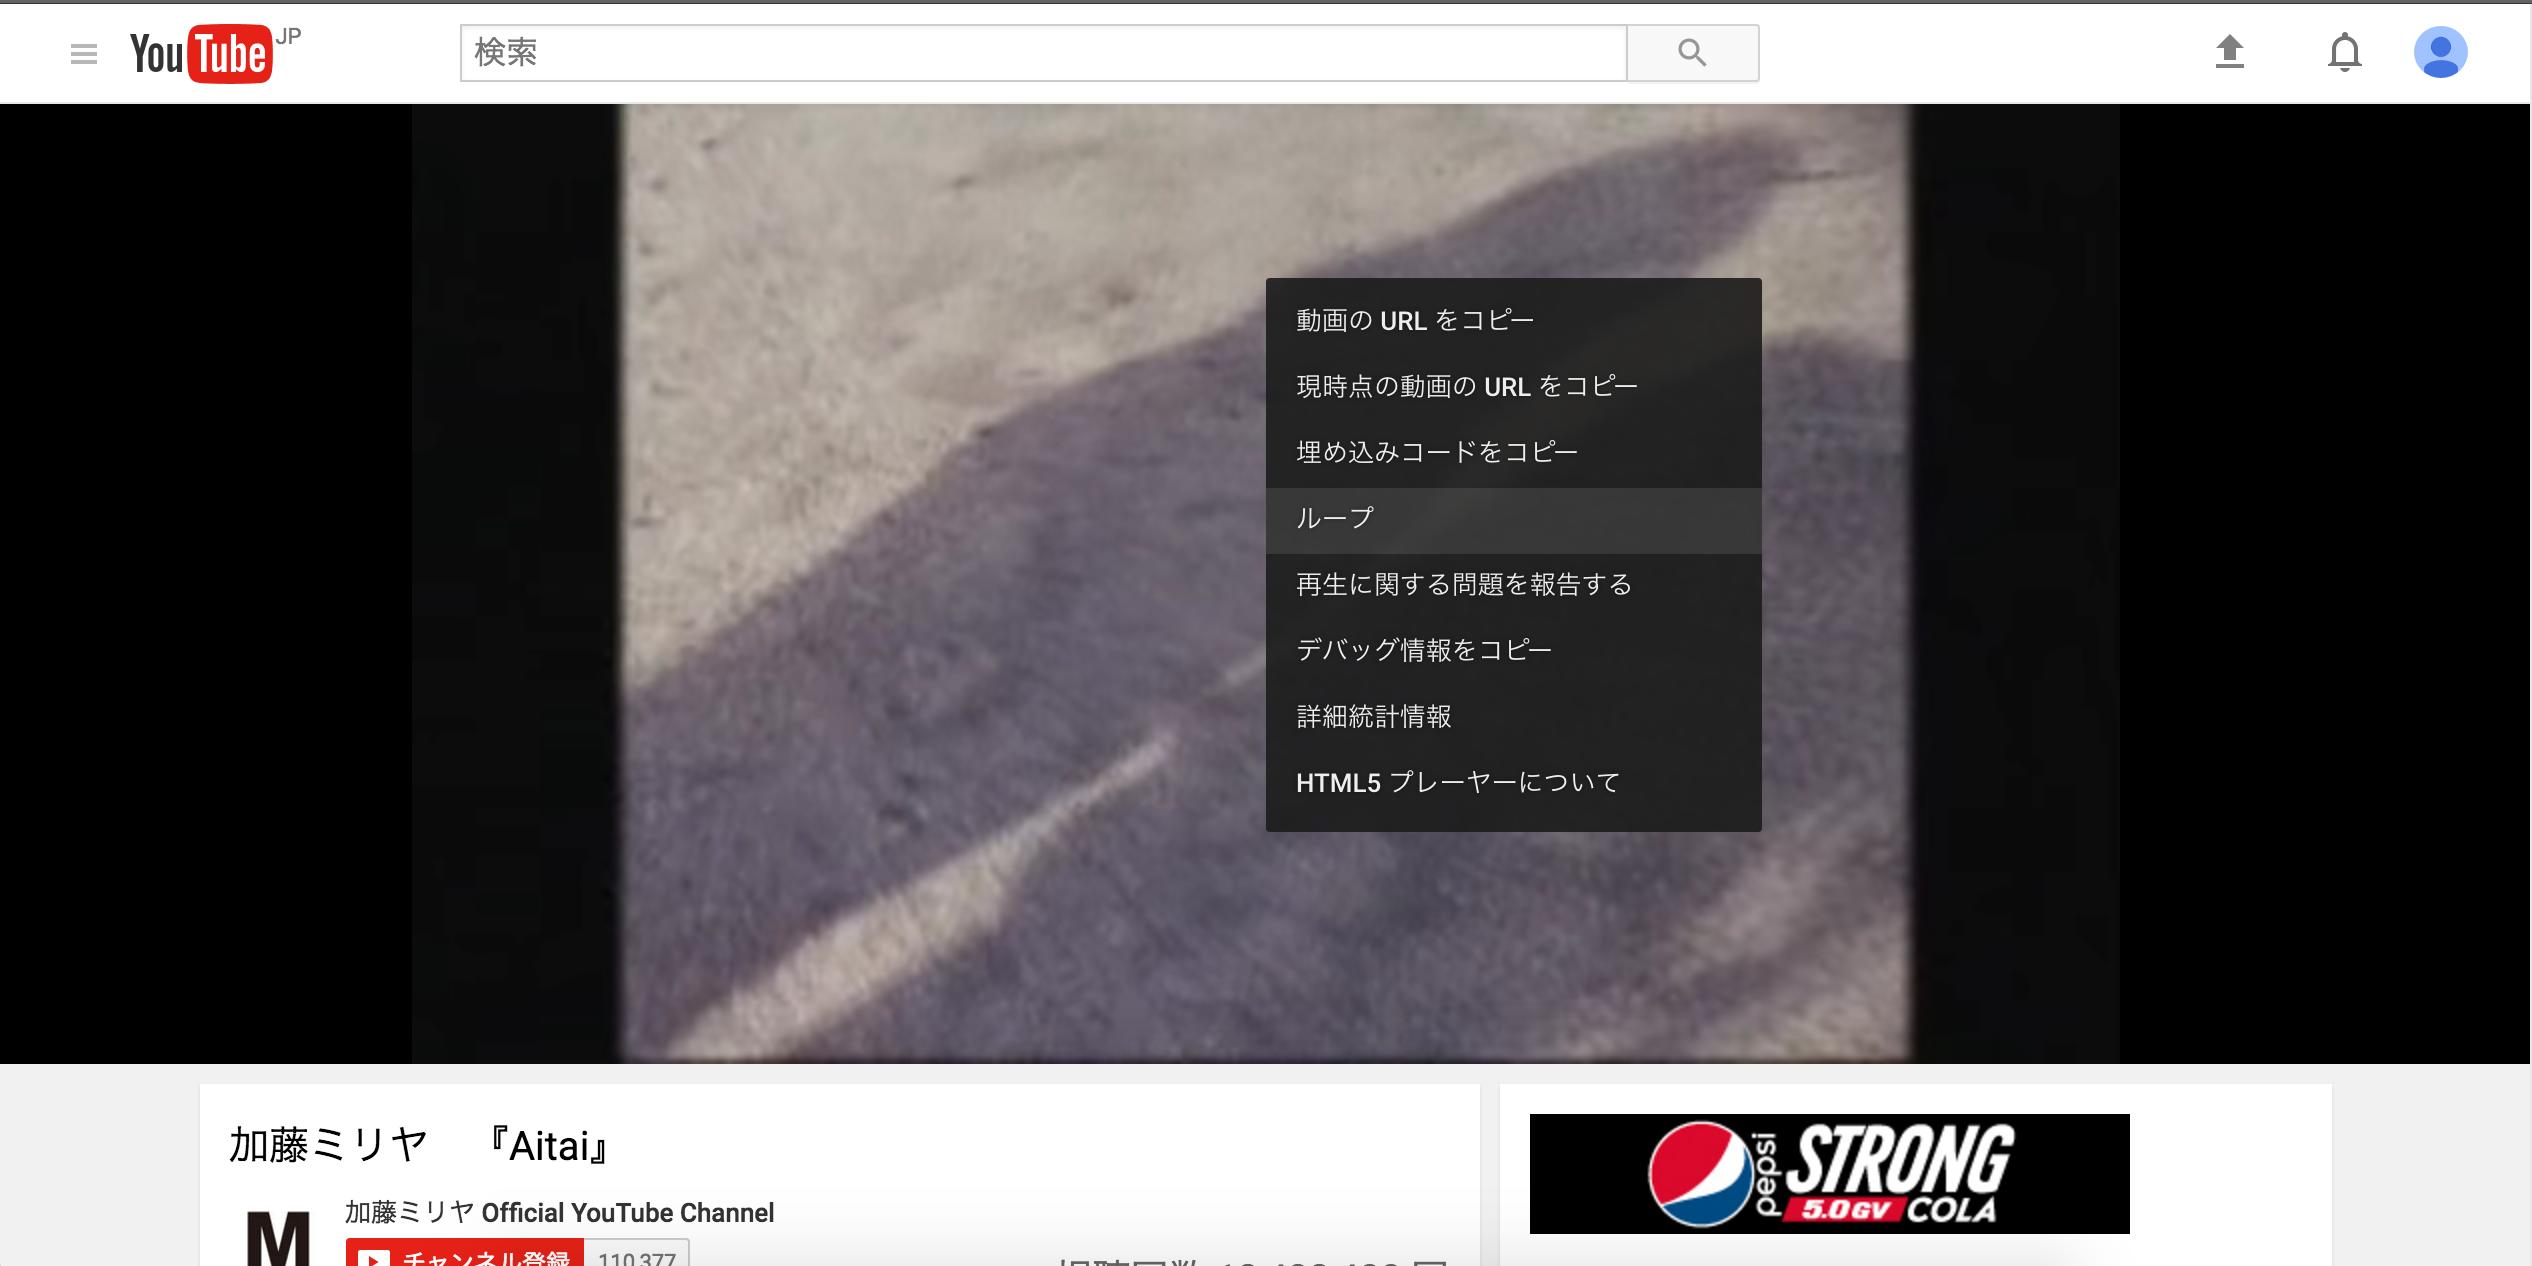 youtubeループ